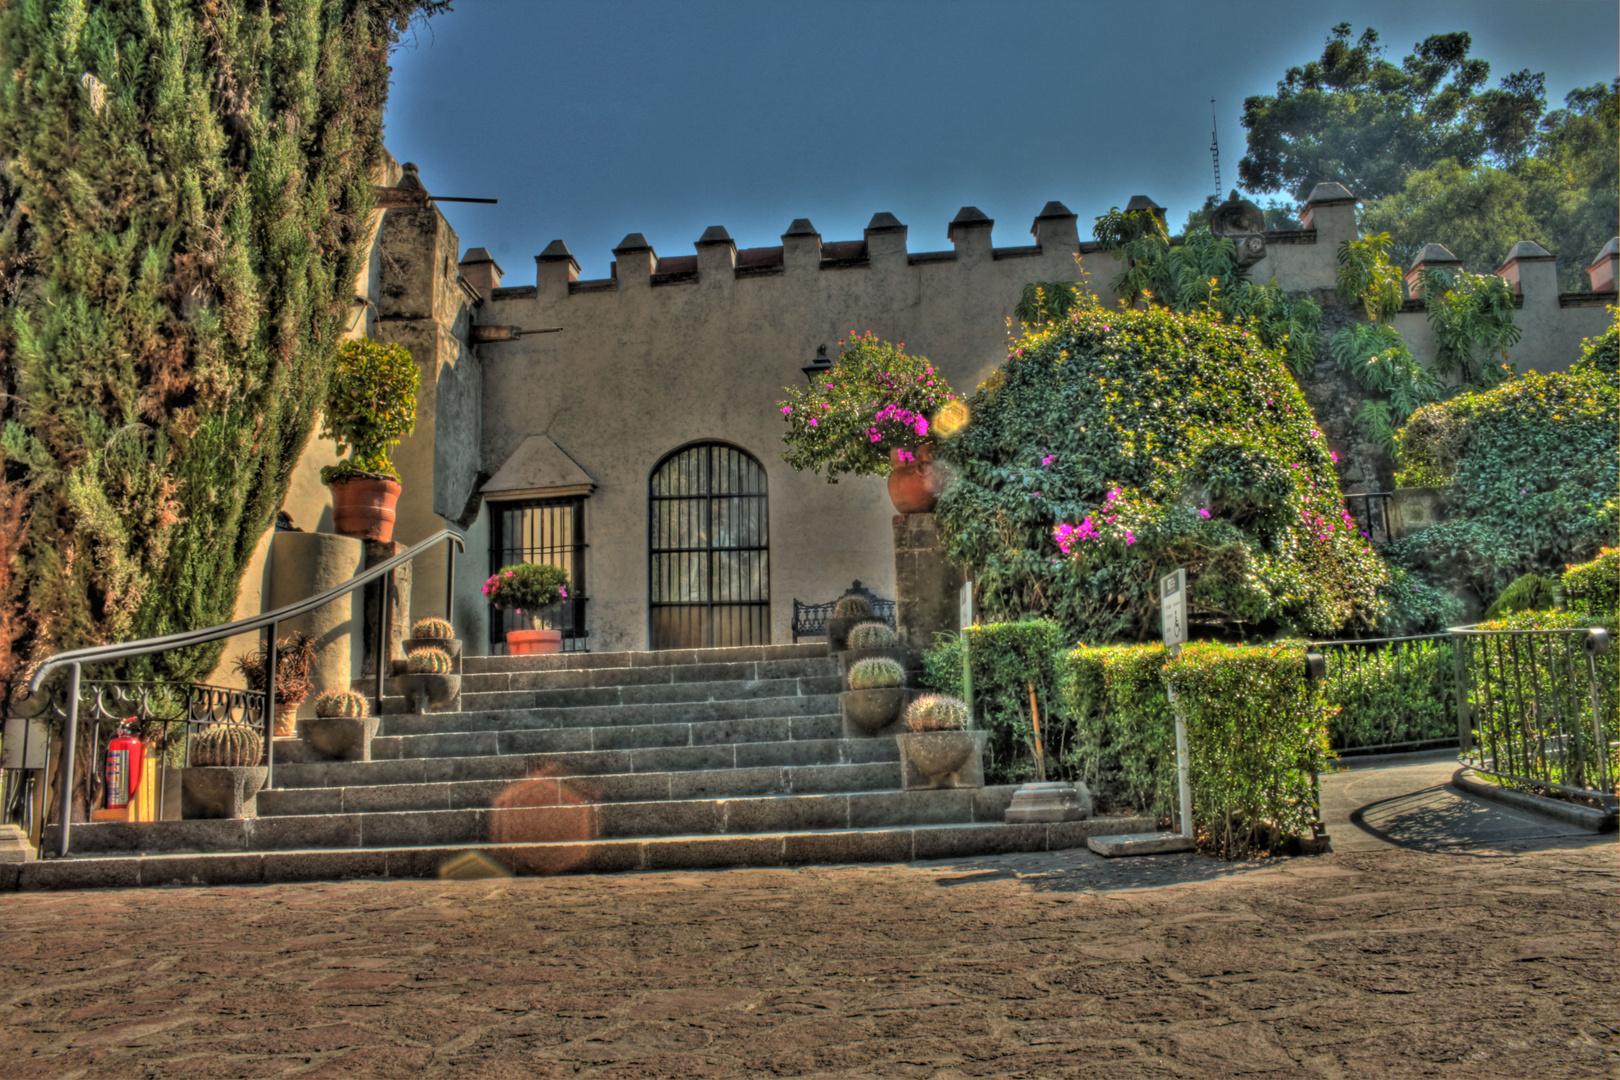 Museo dolores olmedo Xochimilco México D.F. Hab princ.